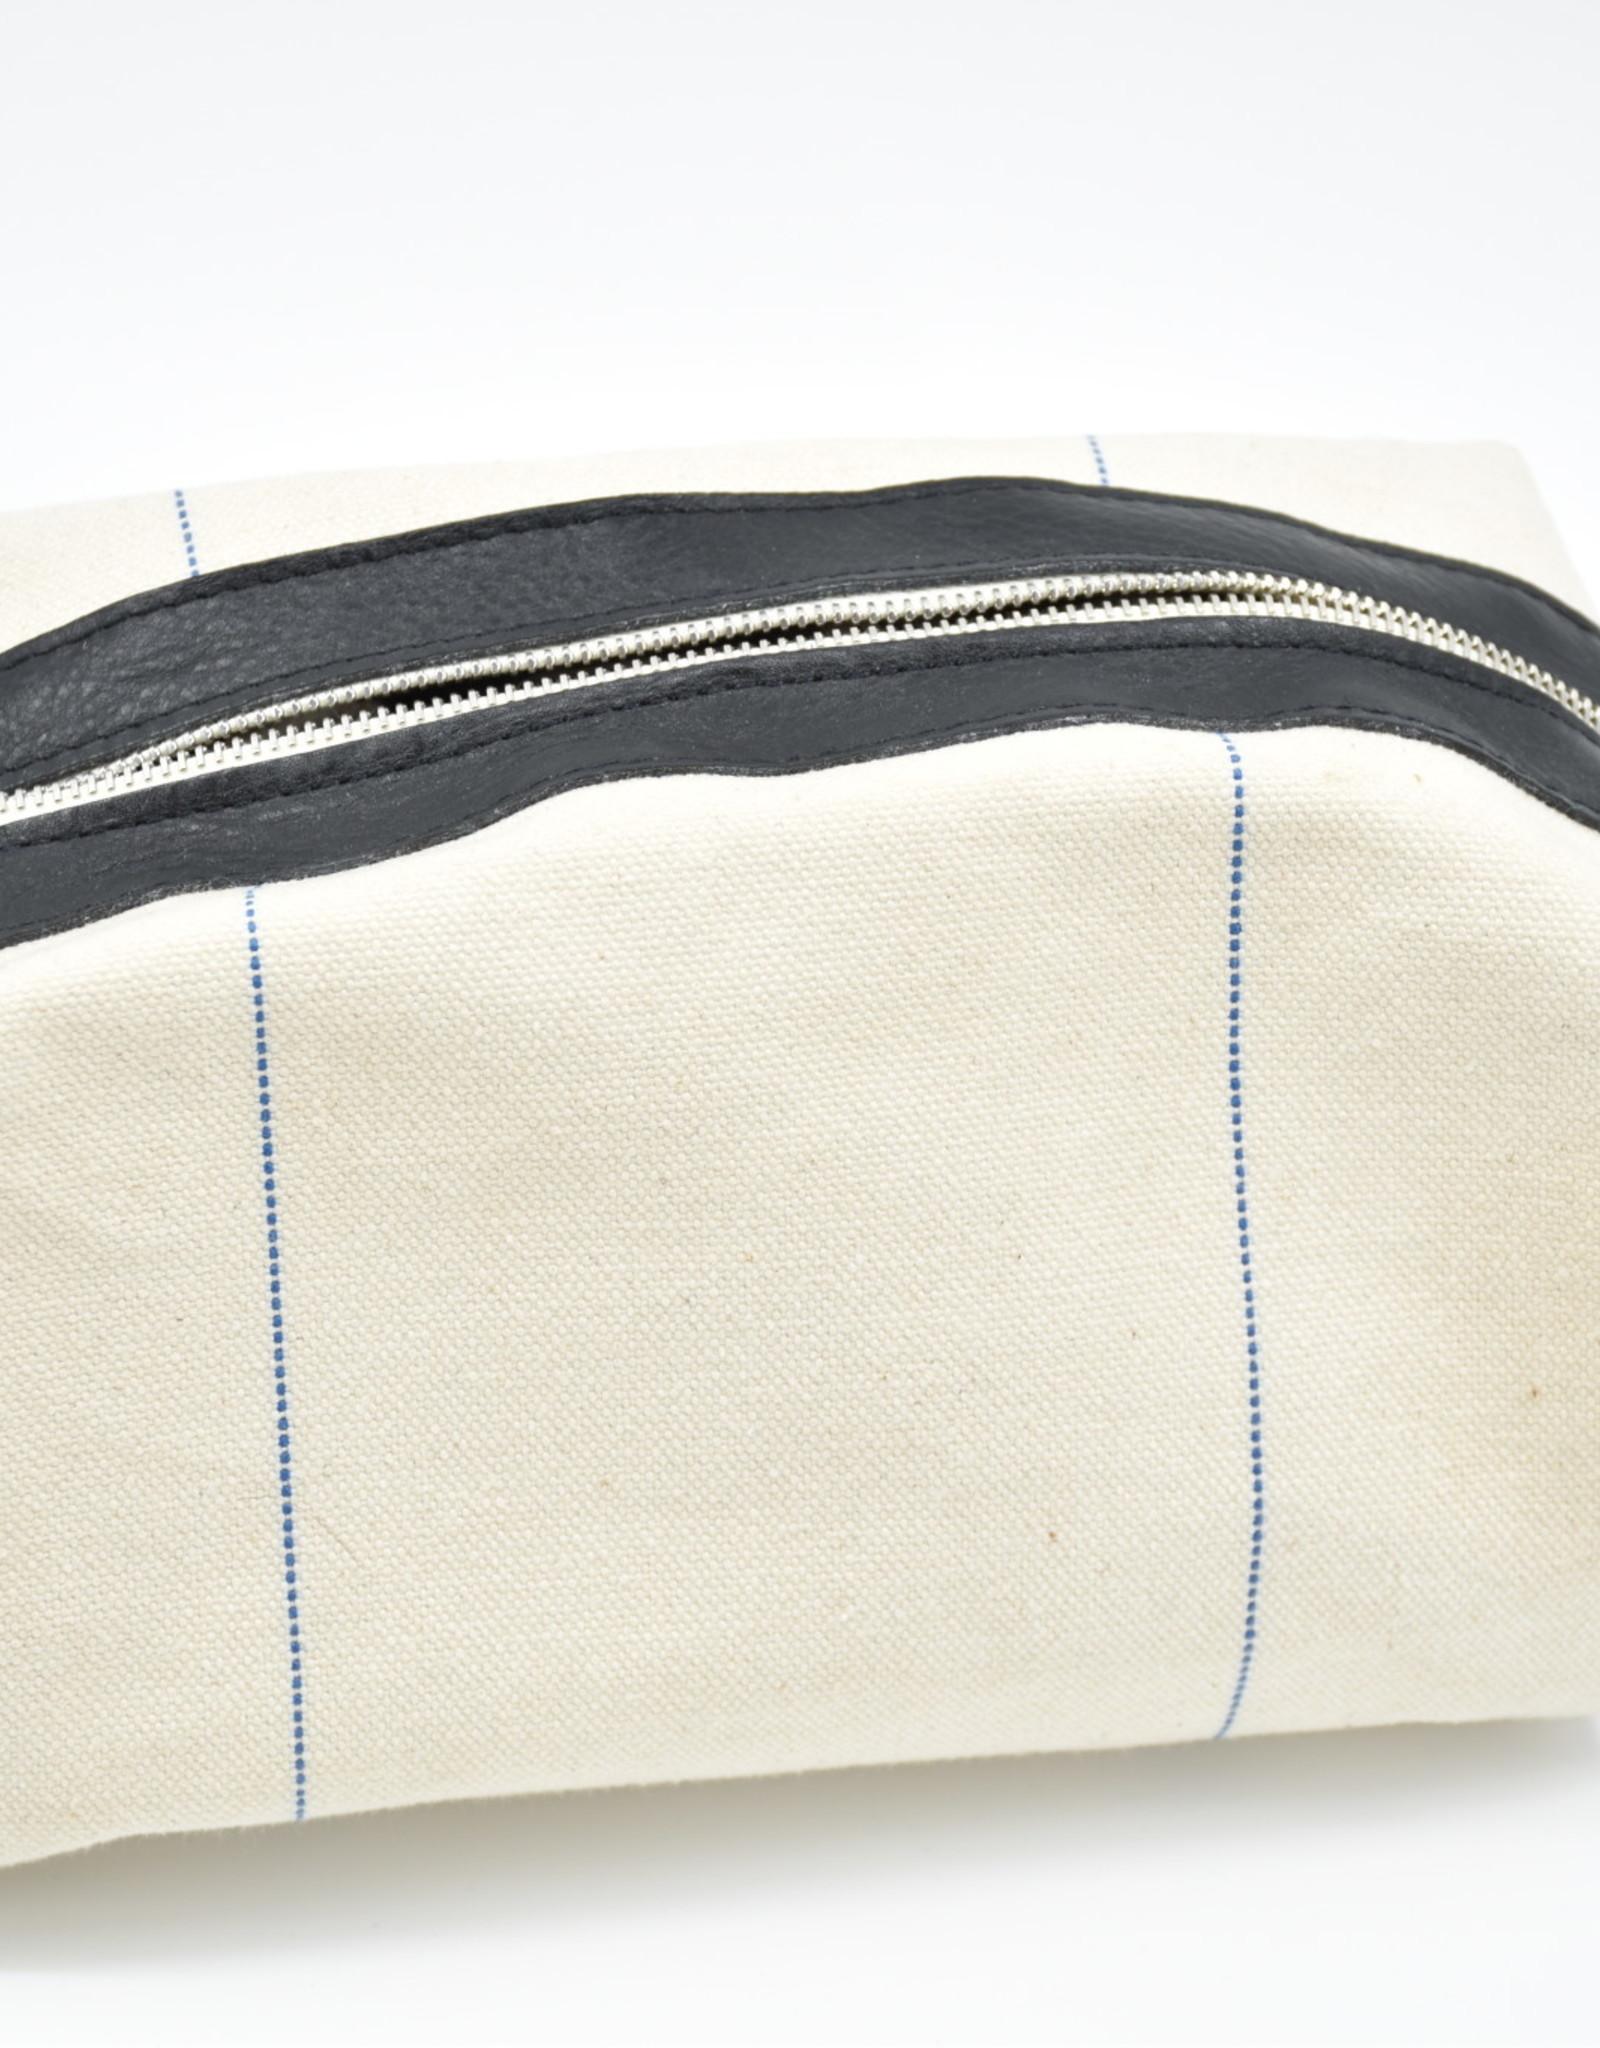 FLEABAGS Canvas & Leather Dopp Kit